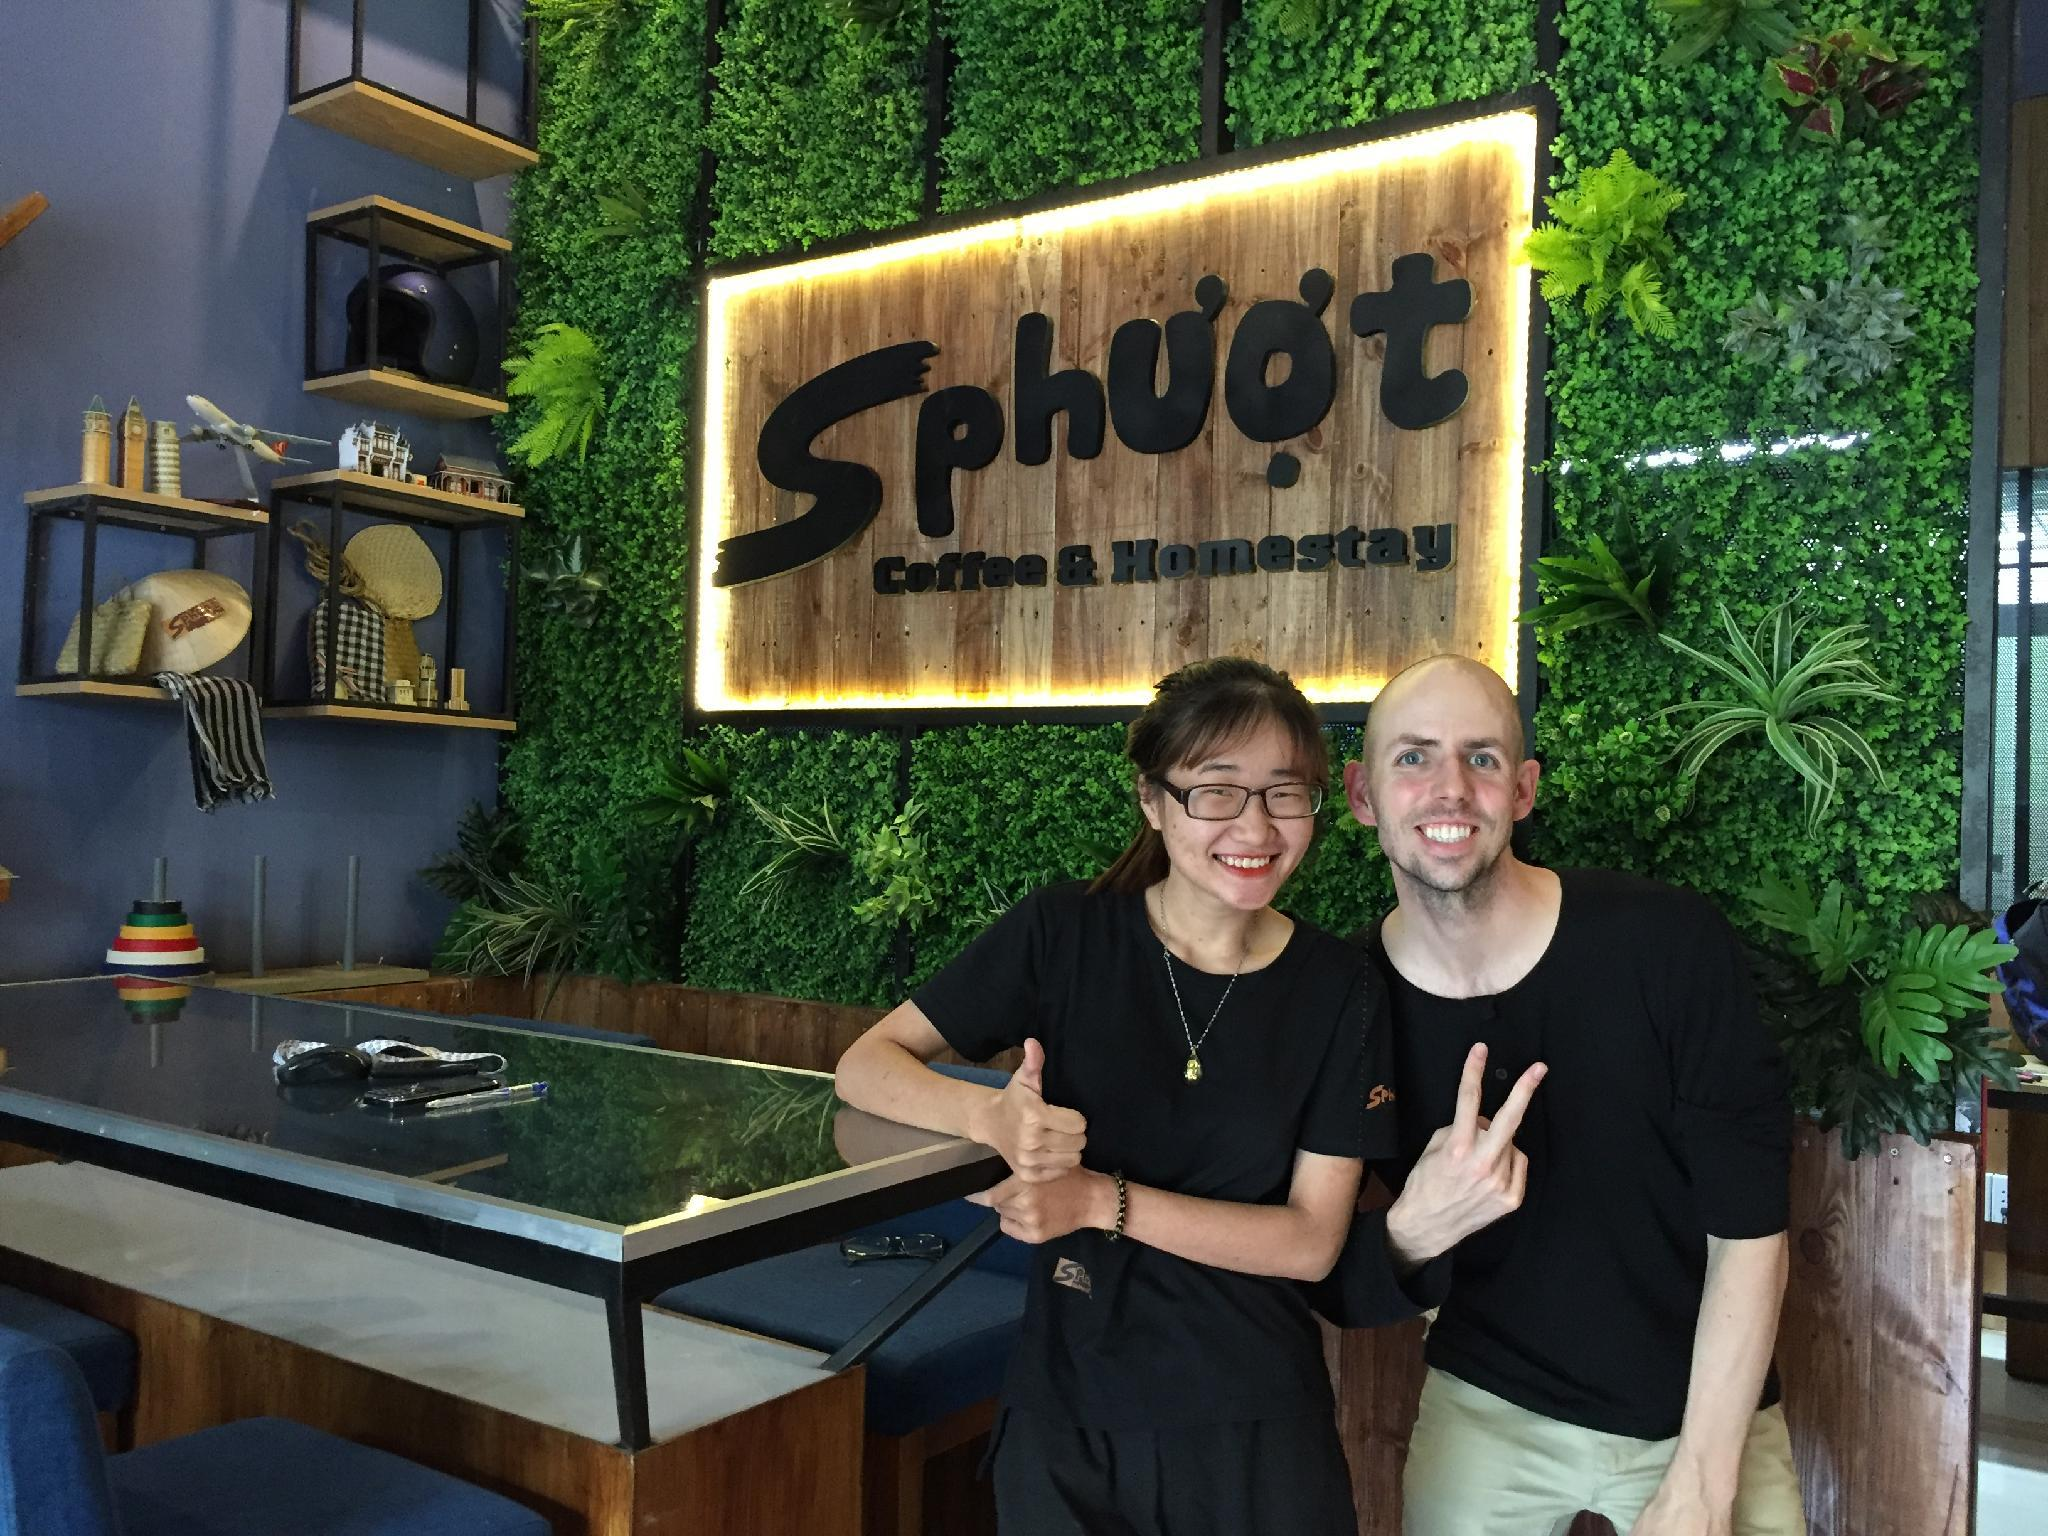 S Phuot Airport Hostel